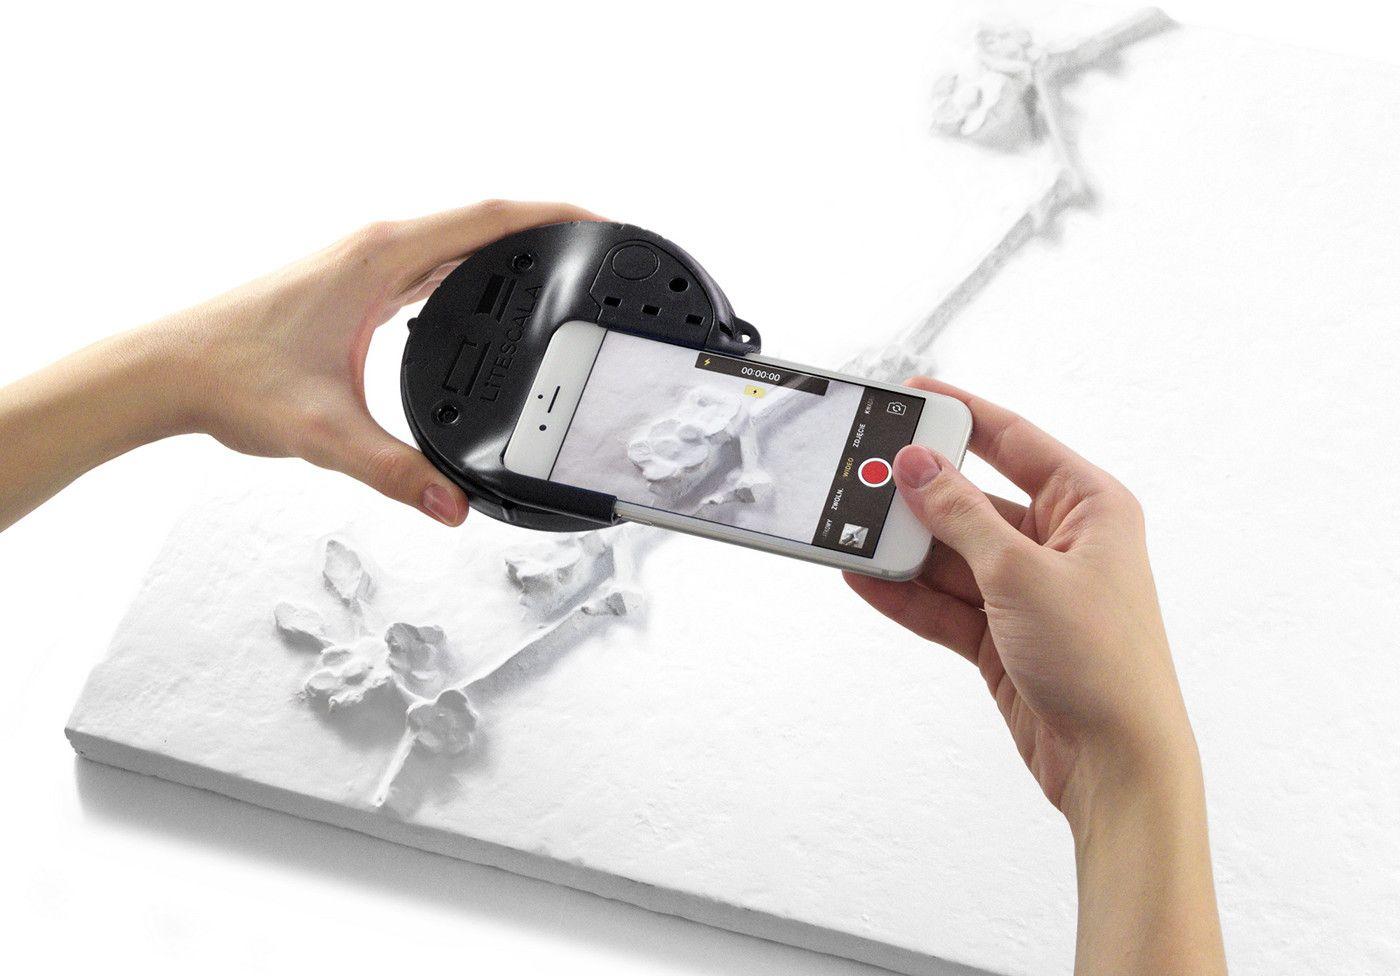 macrophotography, idea, iphone6s